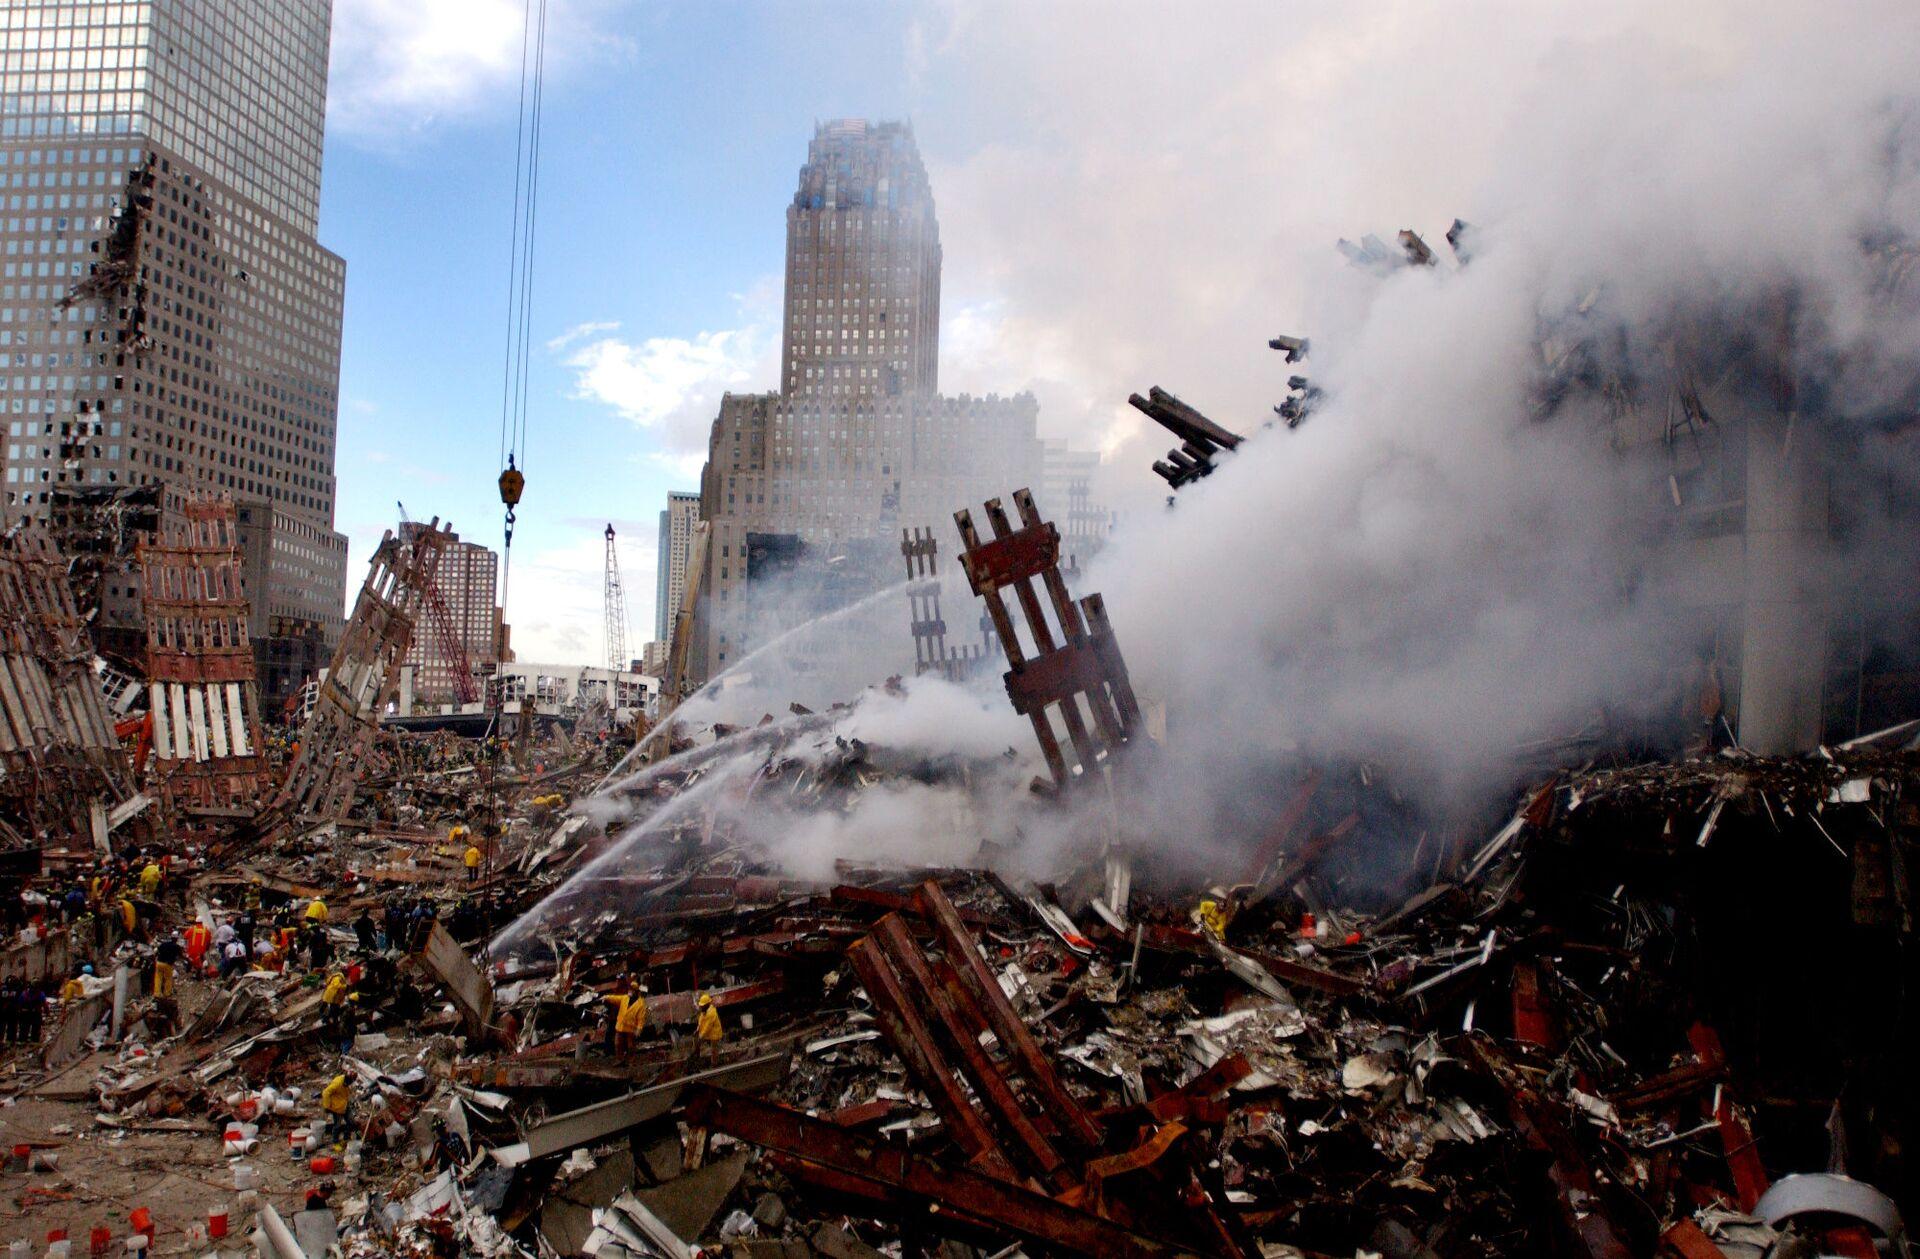 Fires still burn amidst the rubble of the World Trade Center, days after the 11 September terrorist attack. - Sputnik International, 1920, 07.09.2021